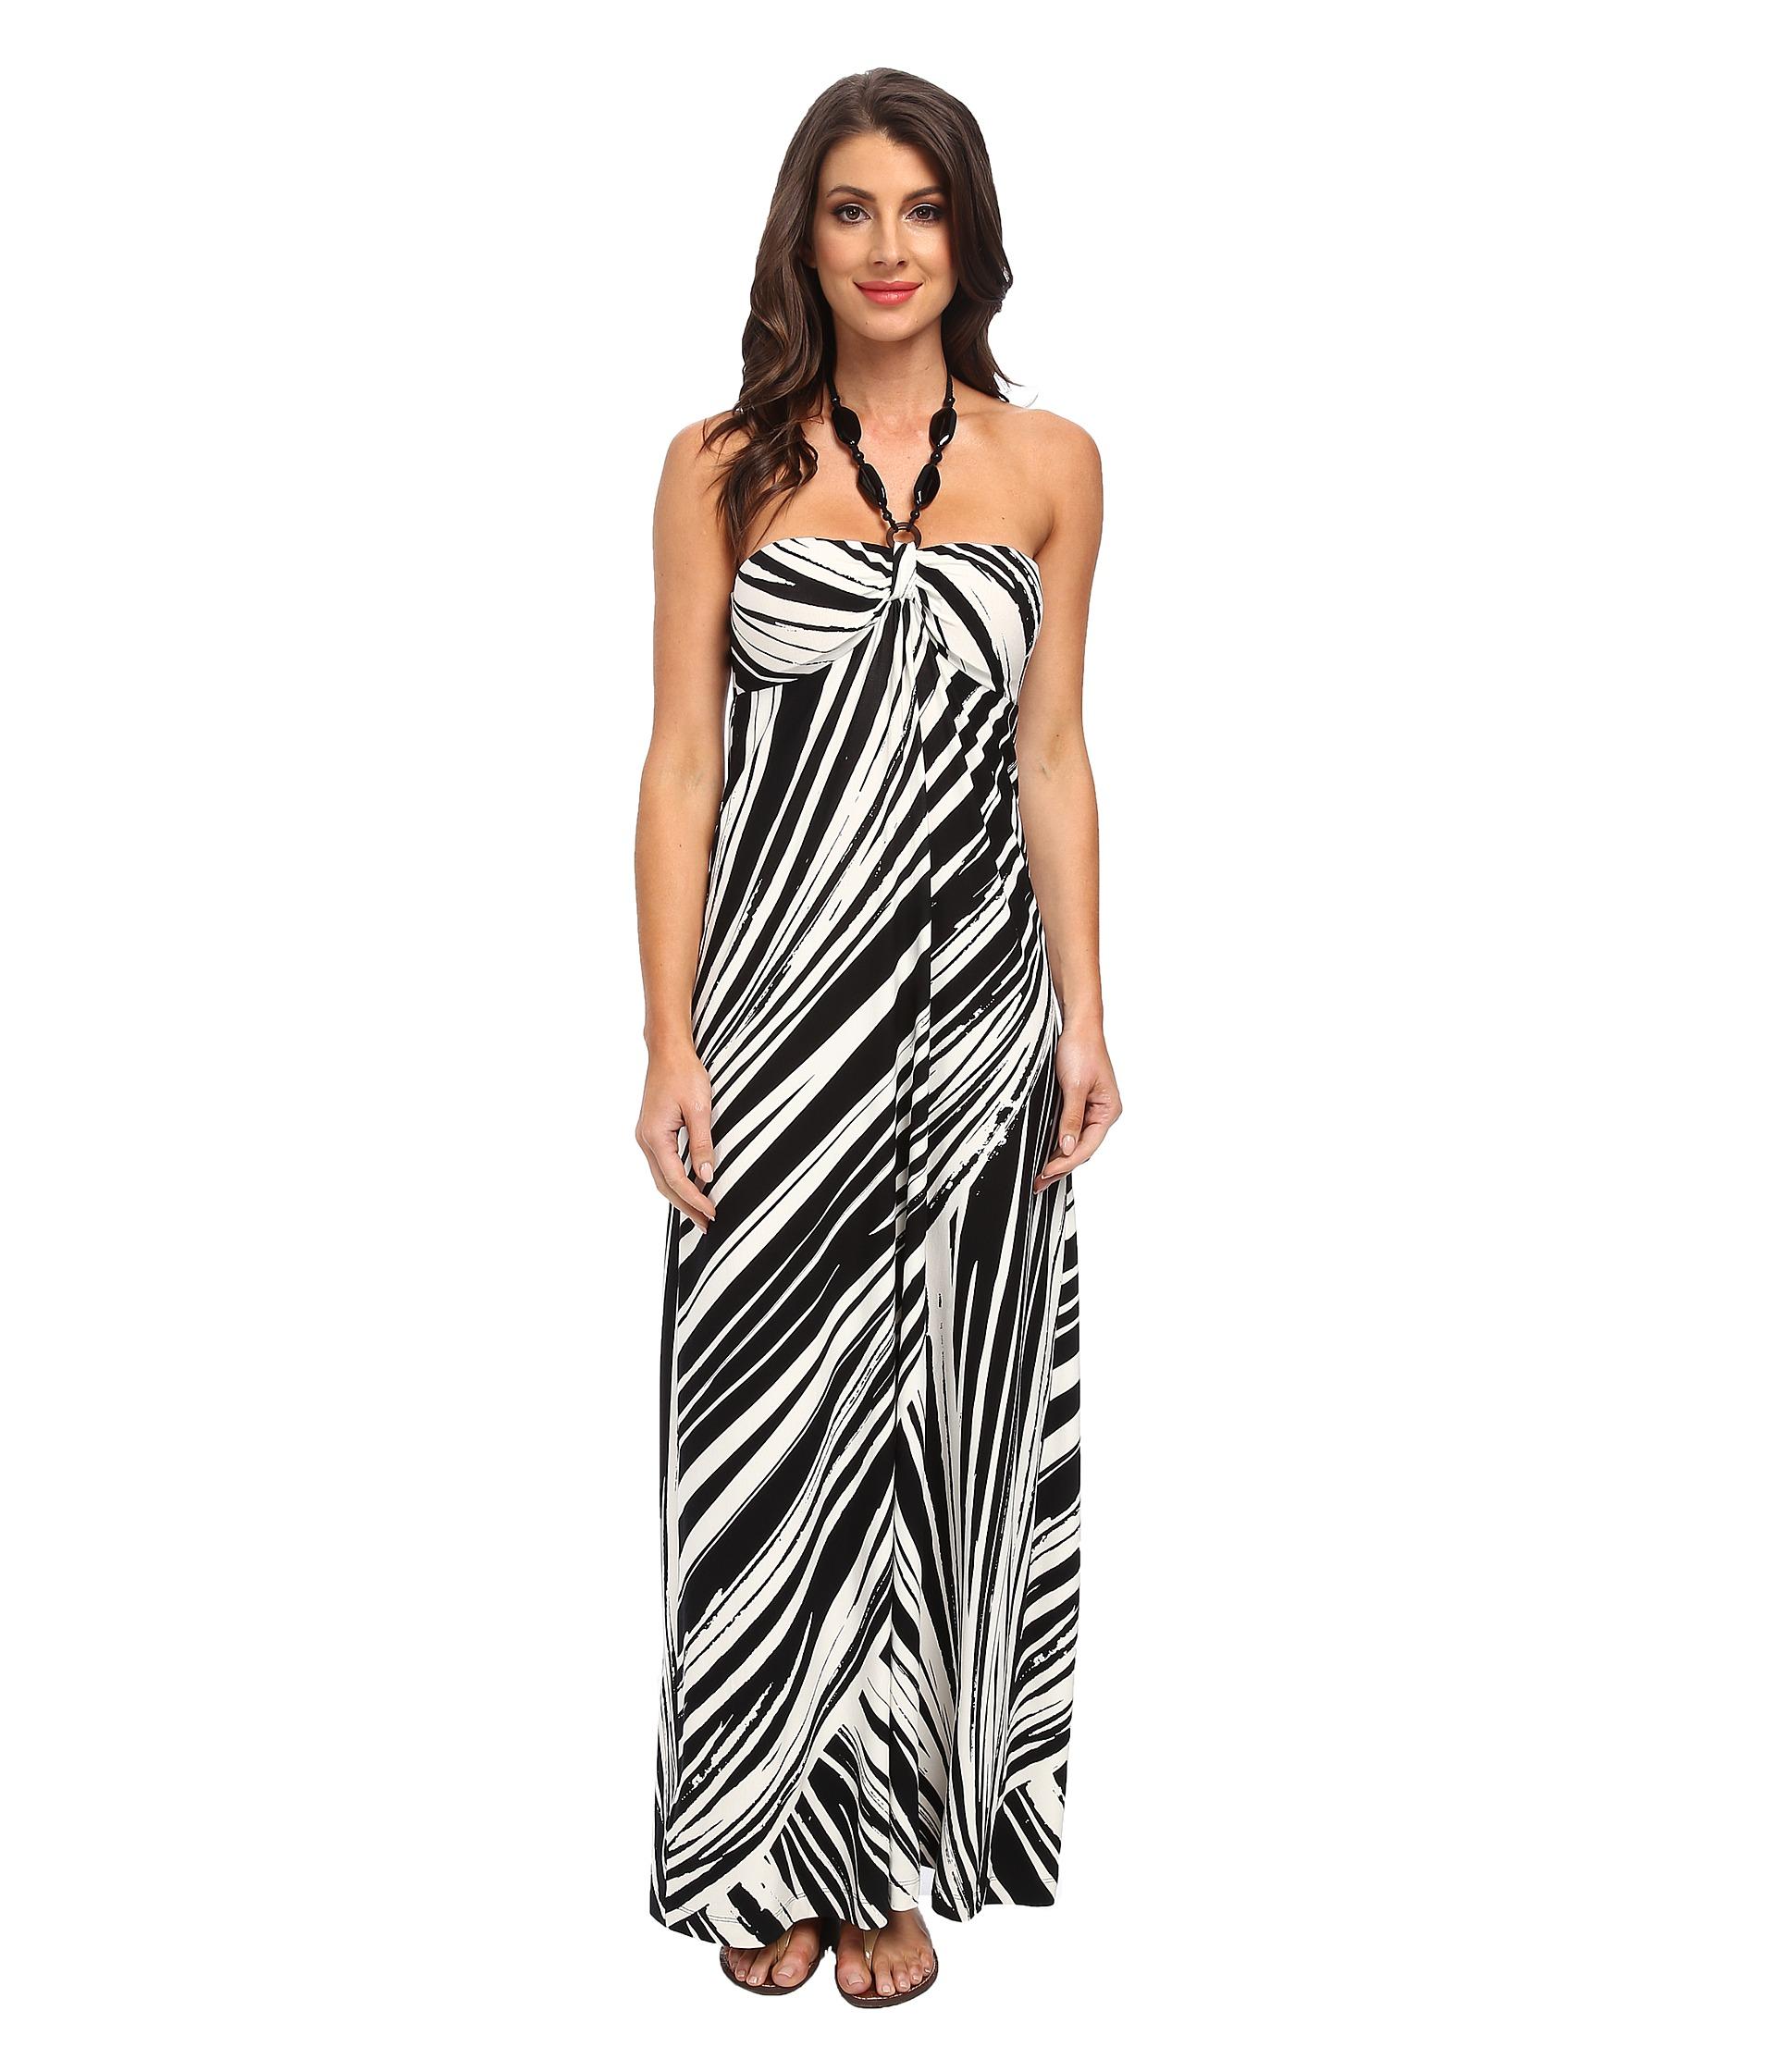 Tommy Bahama Cala Winds Long Dress Black